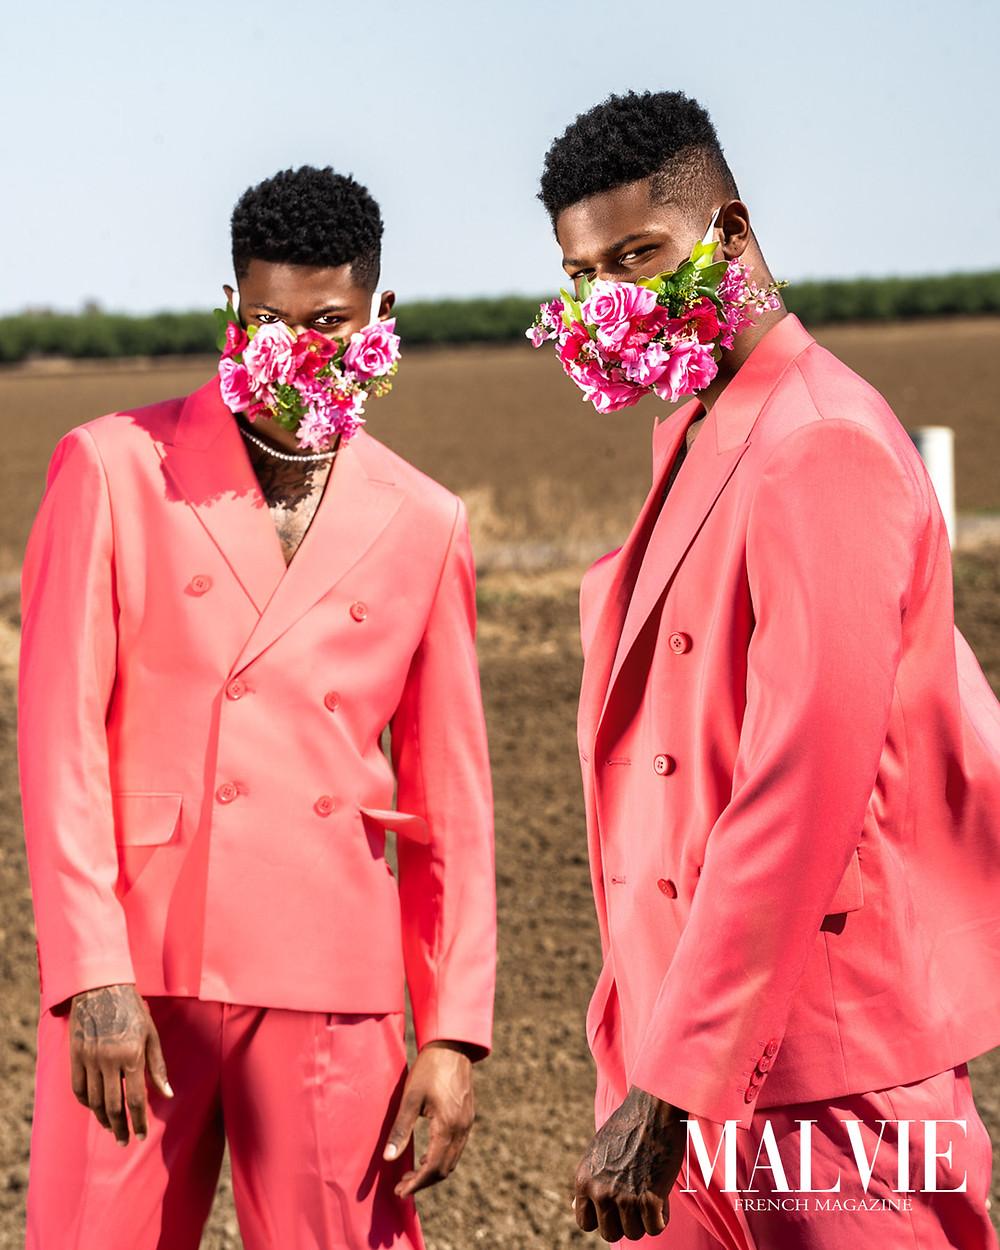 Photographer: MajorKeeper Model: Models @Spellmantwinz Wardrobe Stylist: Wardrobe Stylist: @Michaelmartell_